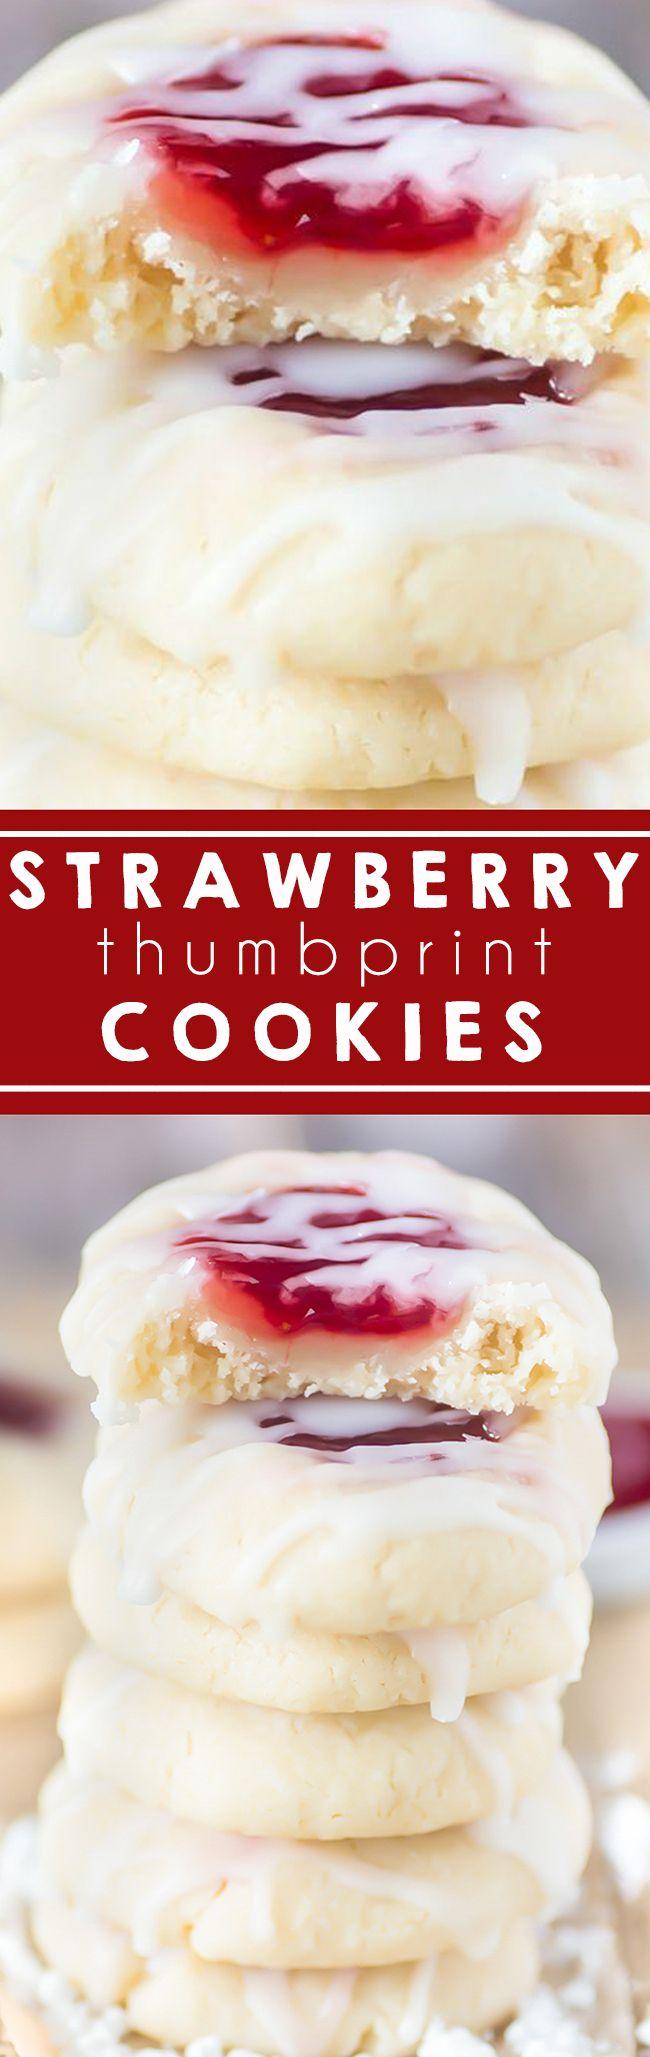 Strawberry Thumbprint Cookies I Almond Cookies I Butter Cookies I Jam Cookies I Jelly I Christmas Cookies I Old Fashioned  #thumbprintcookies #christmascookies #strawberry